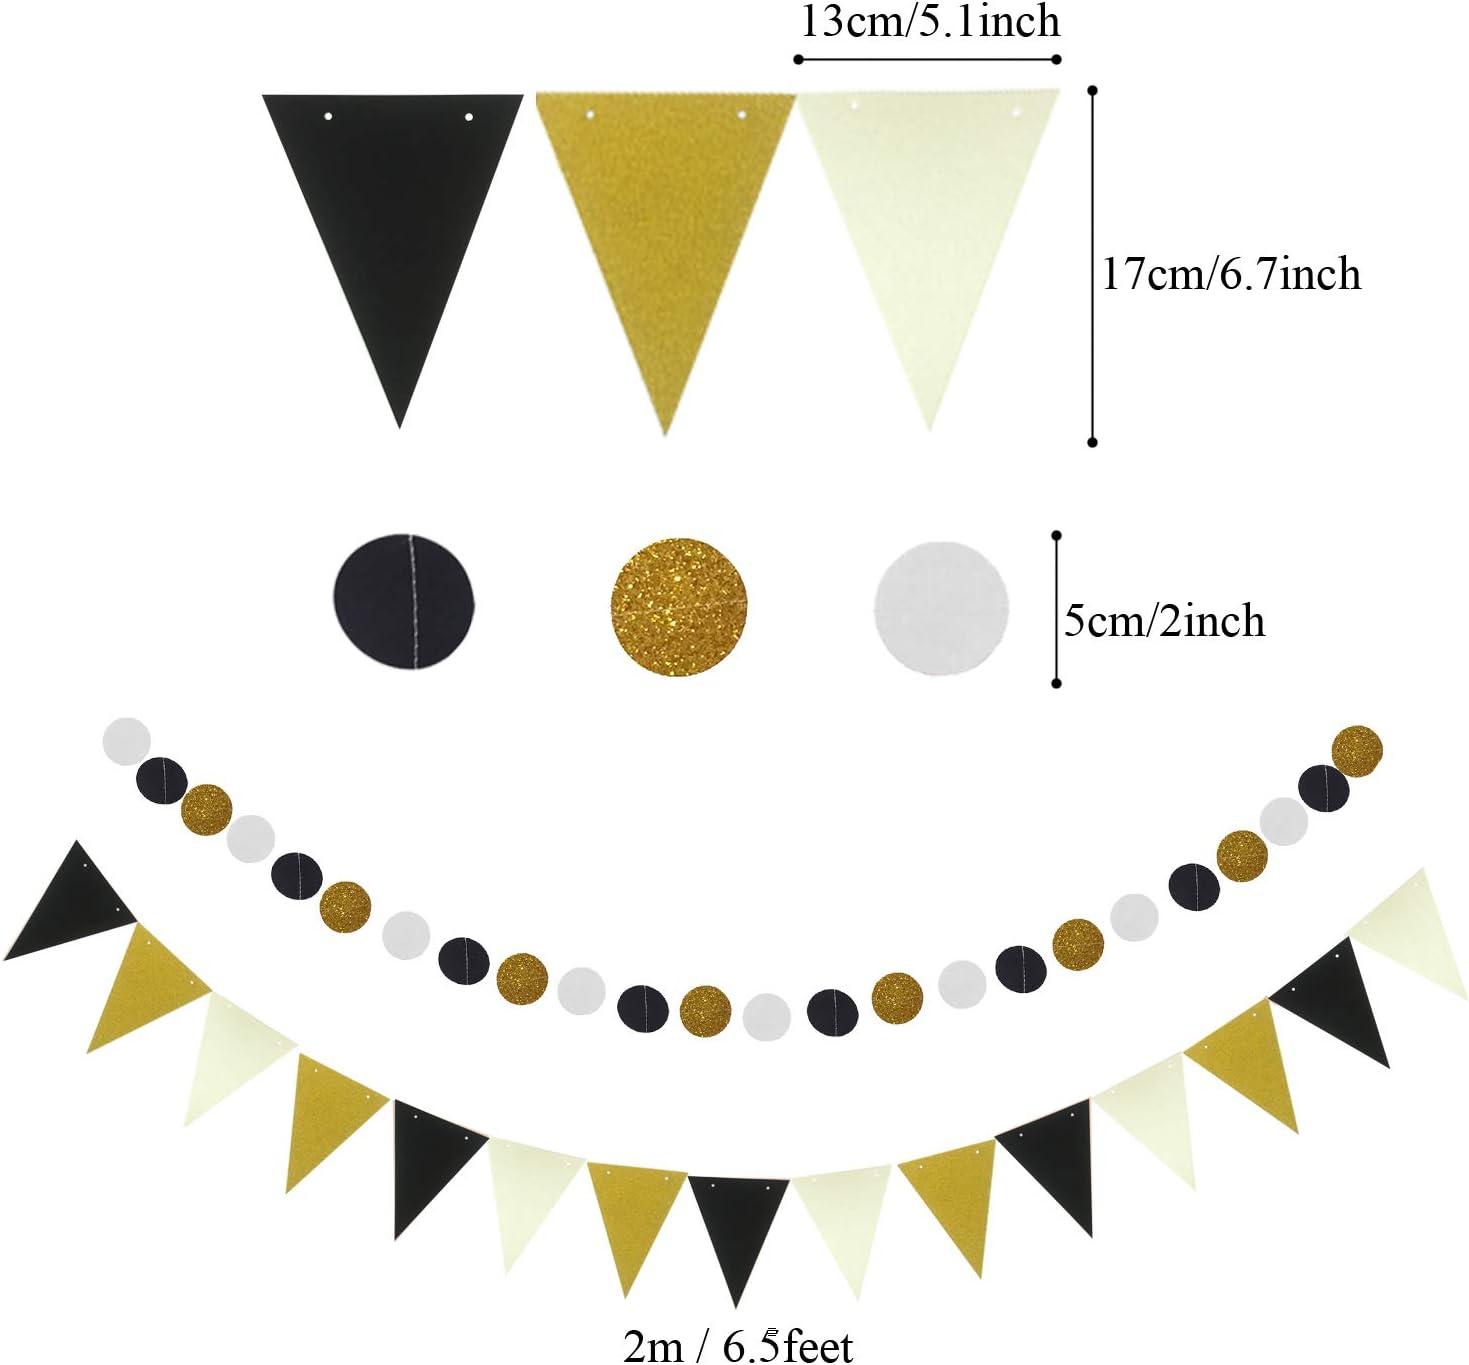 Pom Poms 21 Pcs Black and Gold Hanging Paper Fans Zerodeco Party Decoration